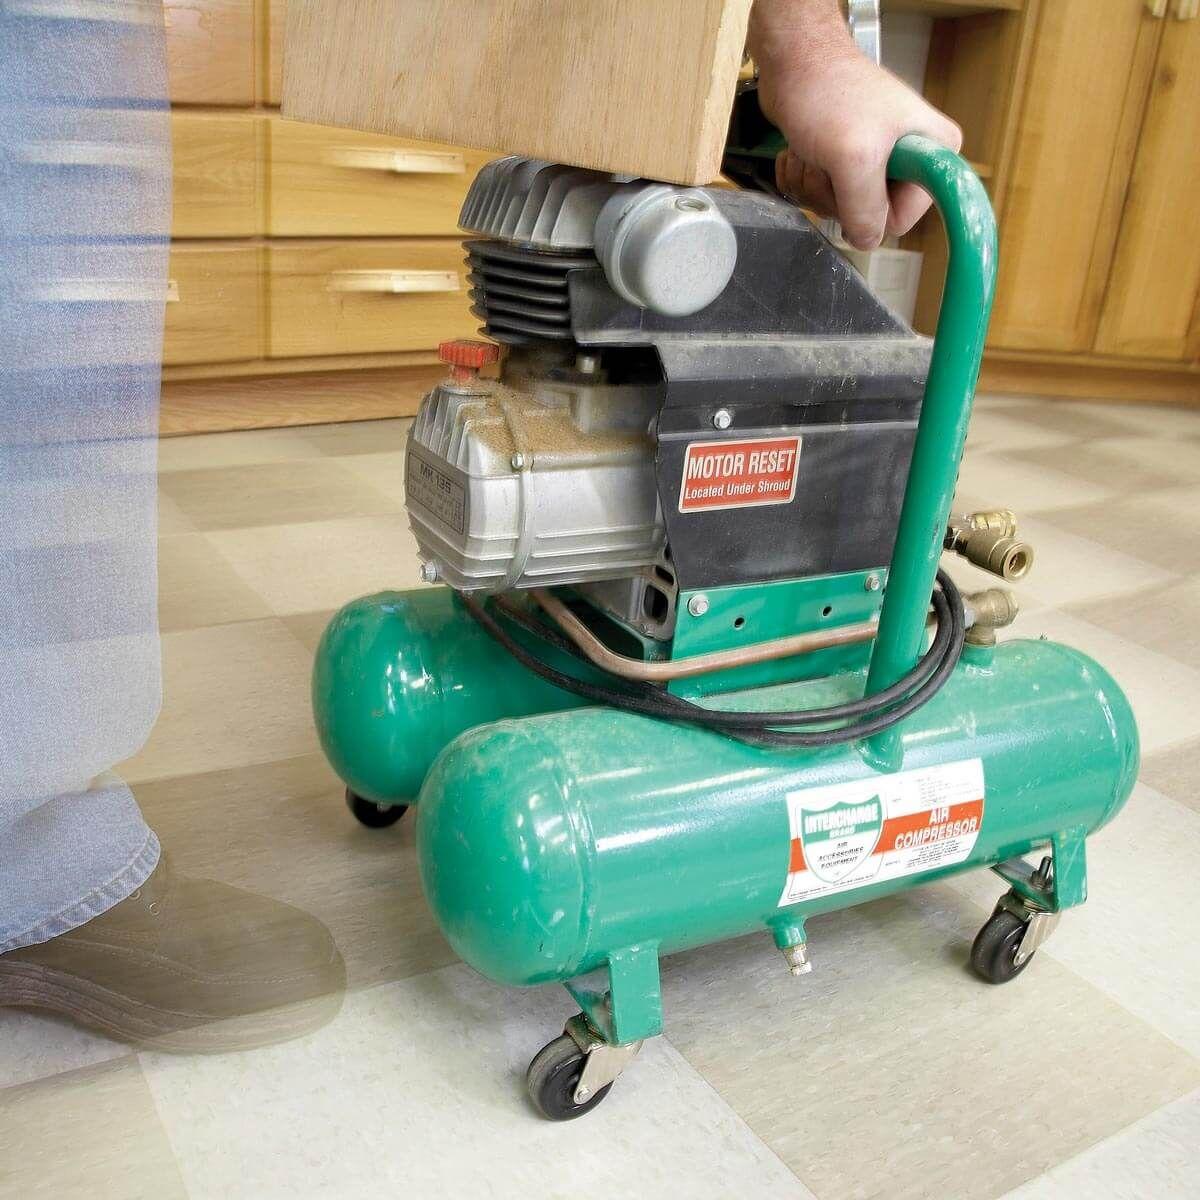 A Wheely Portable Compressor! Portable compressor